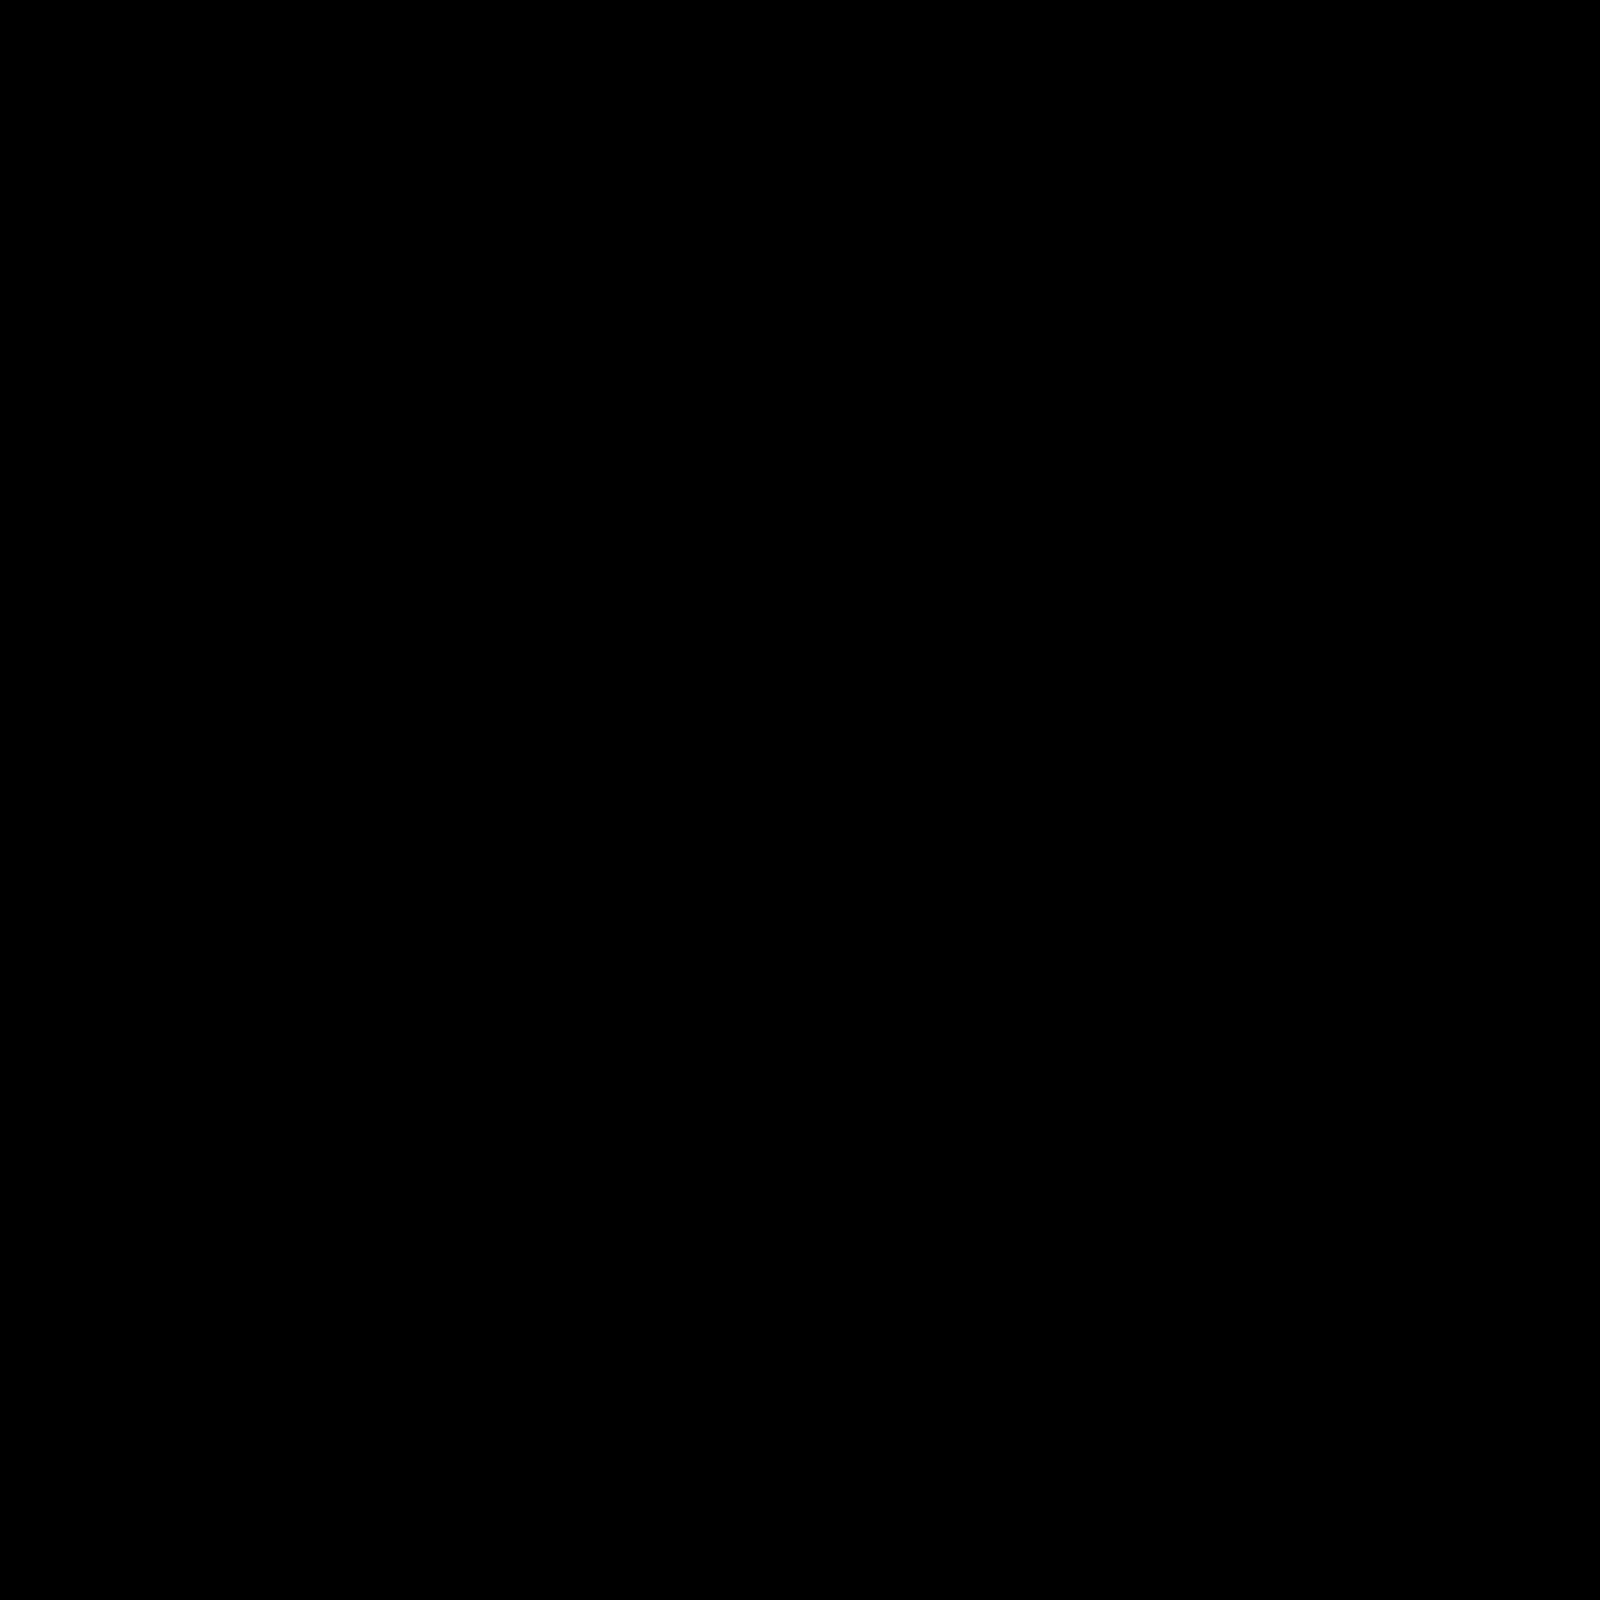 Singapore Territory icon